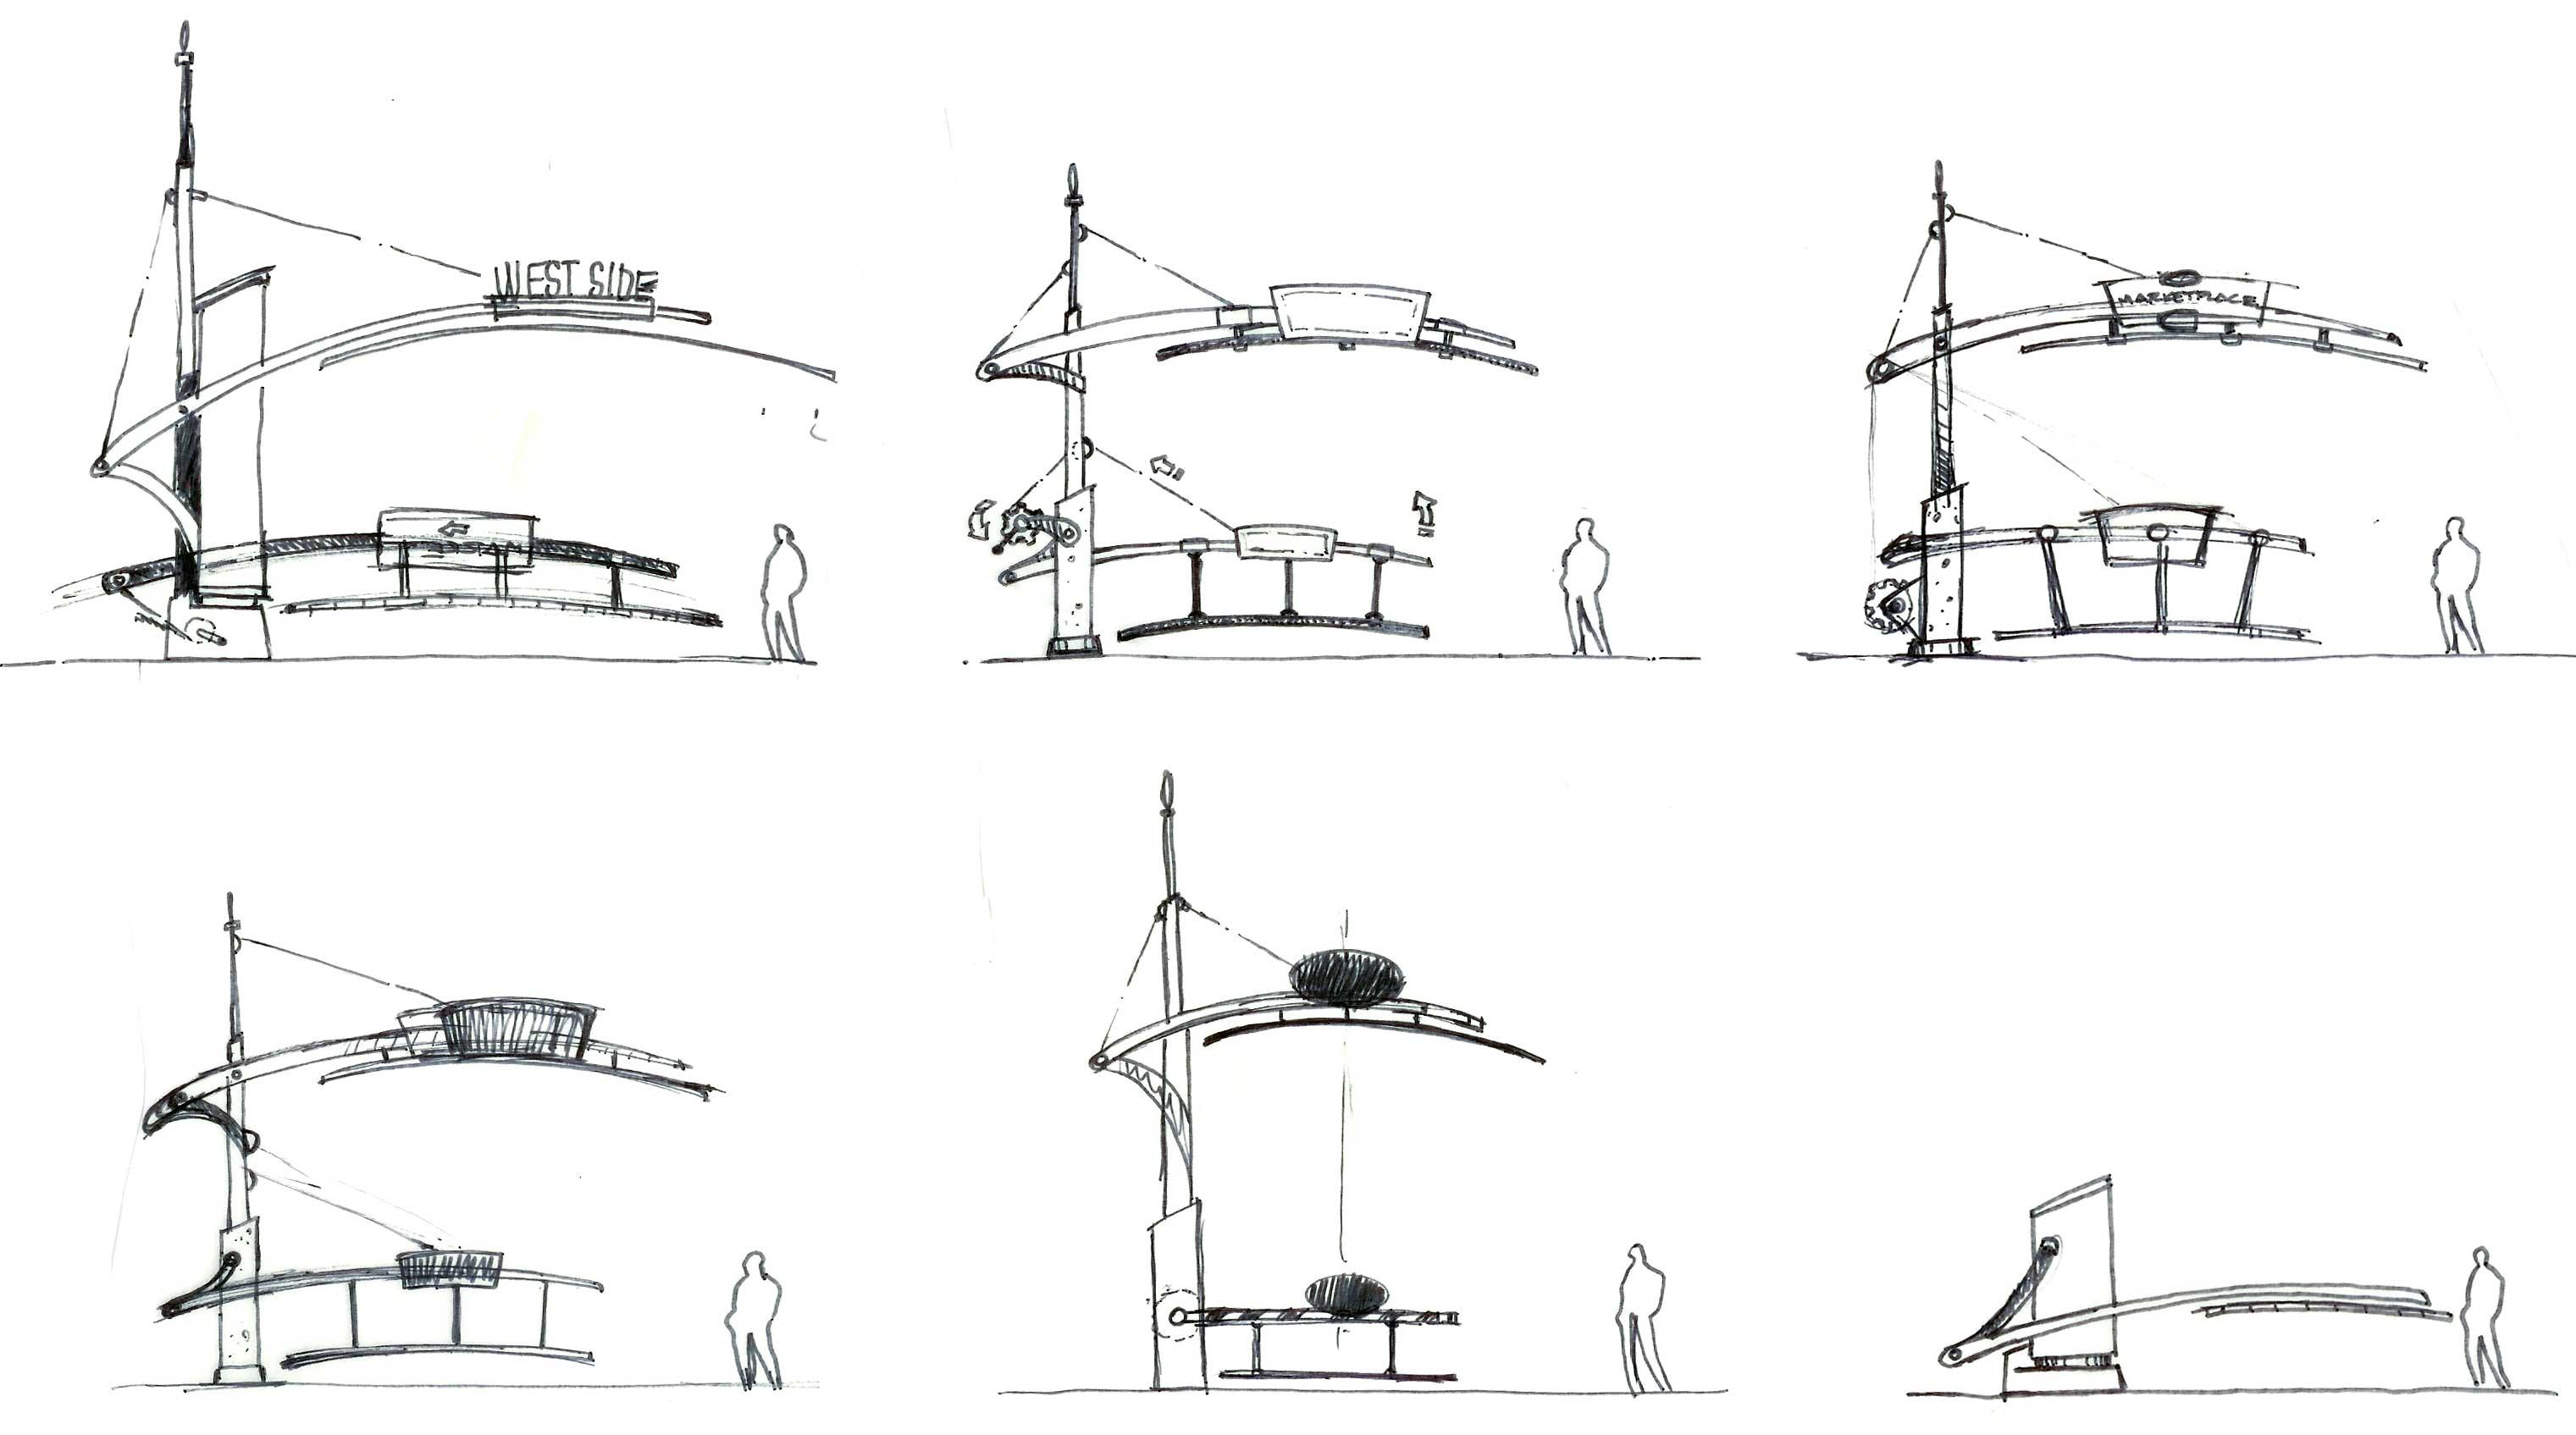 Pedestrian Gate Concepts By Brian Setser